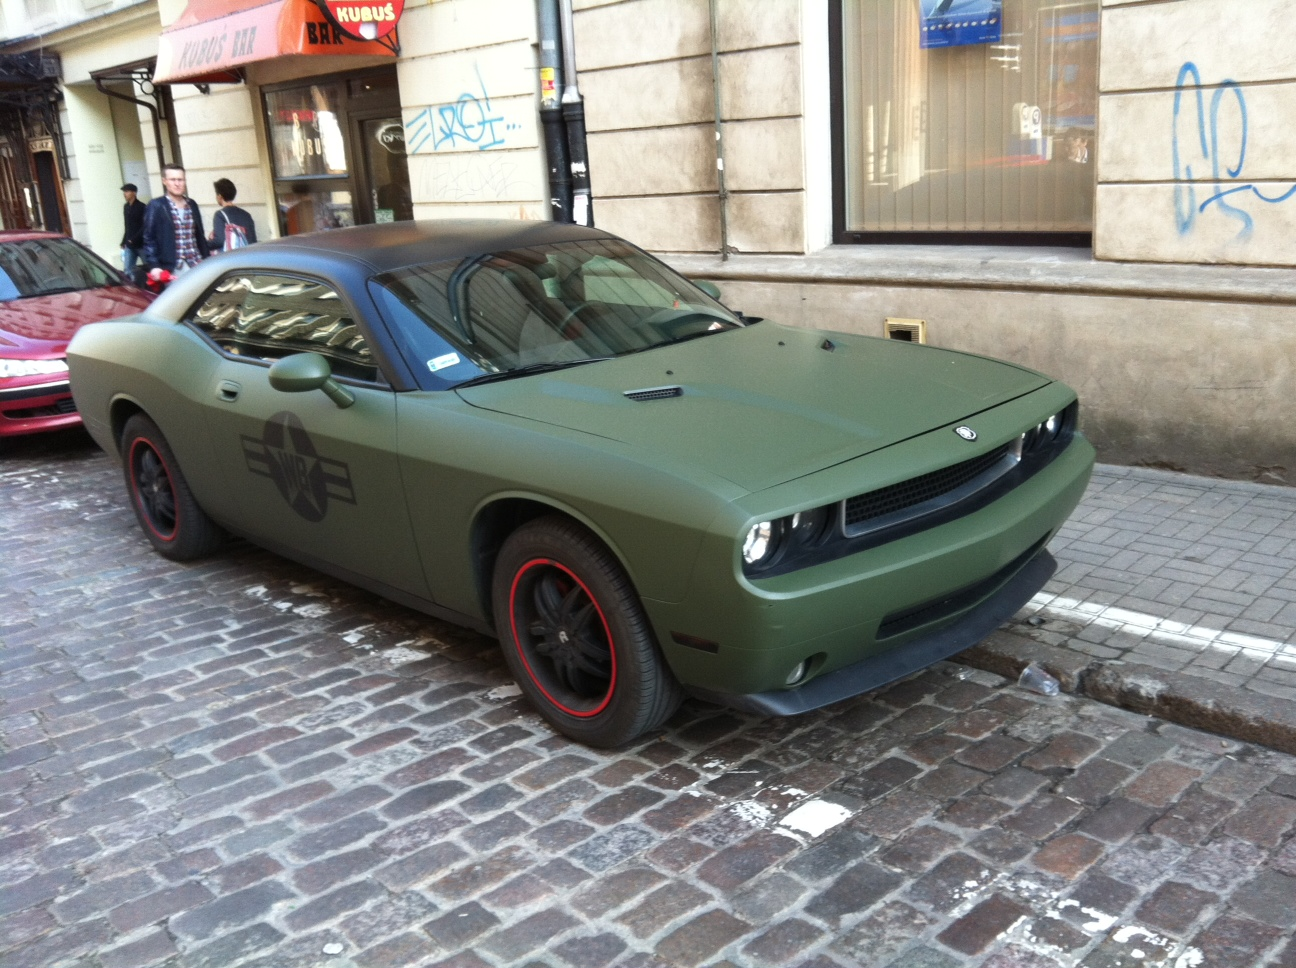 pin mopar muscle car - photo #19